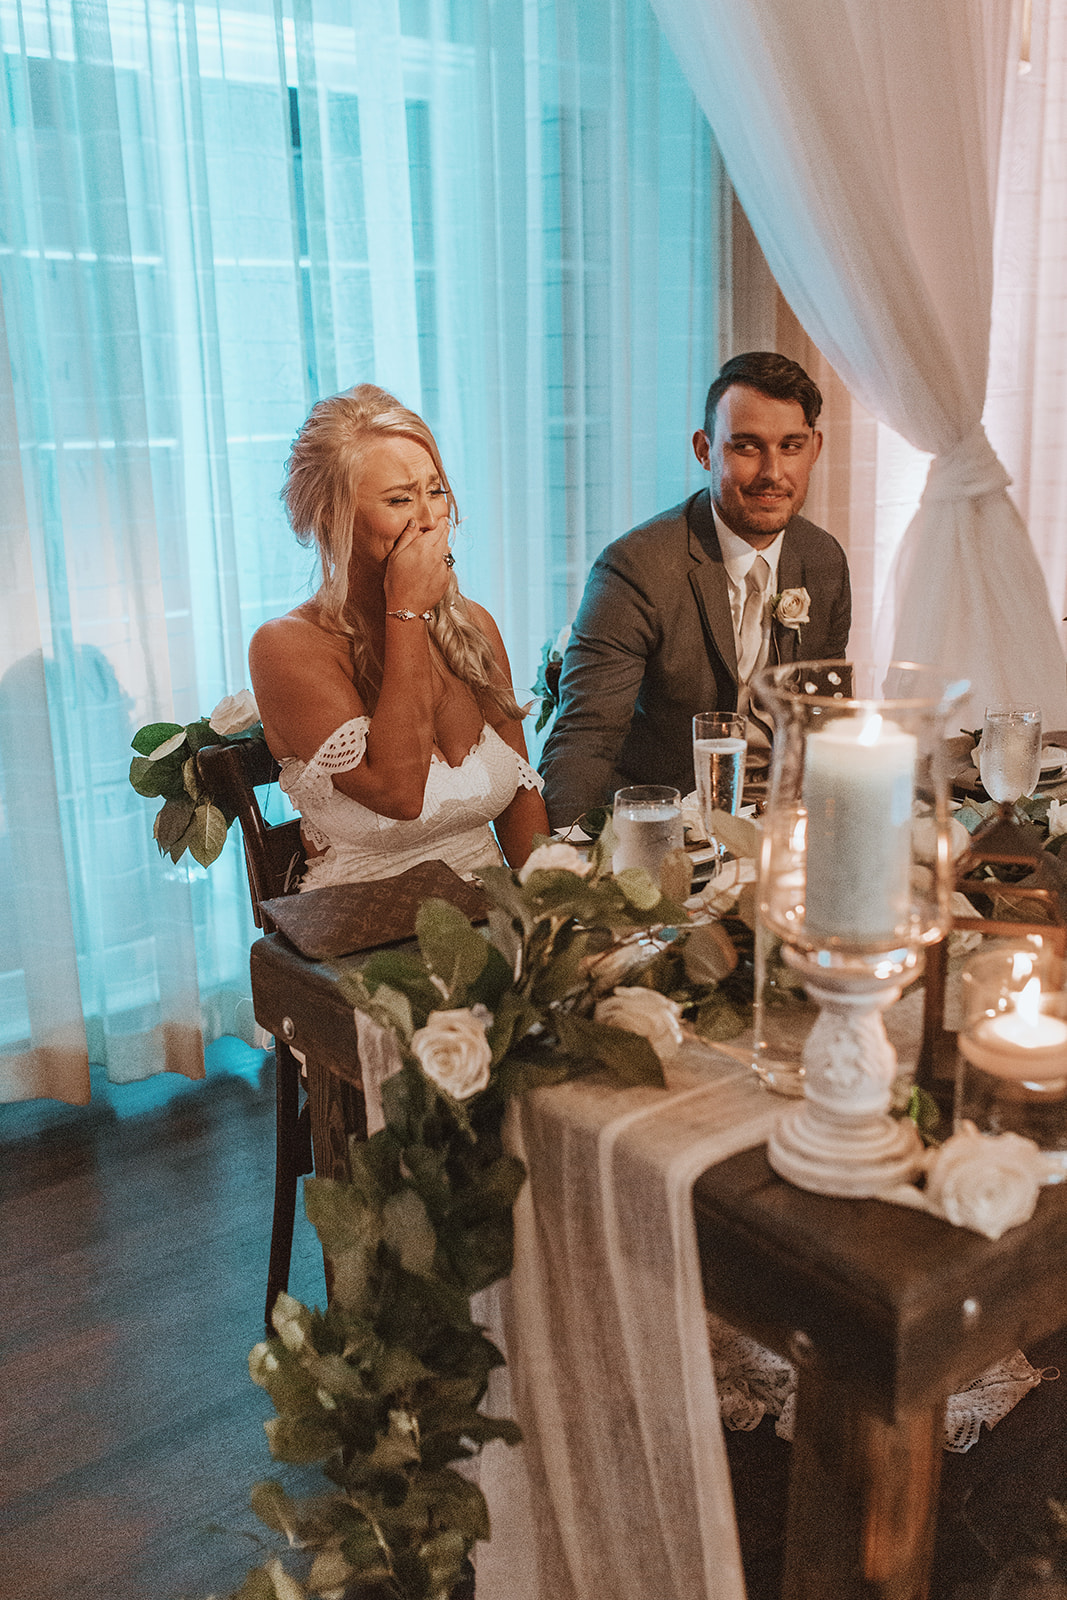 Katye_and_Jason_Wedding-0840.jpg